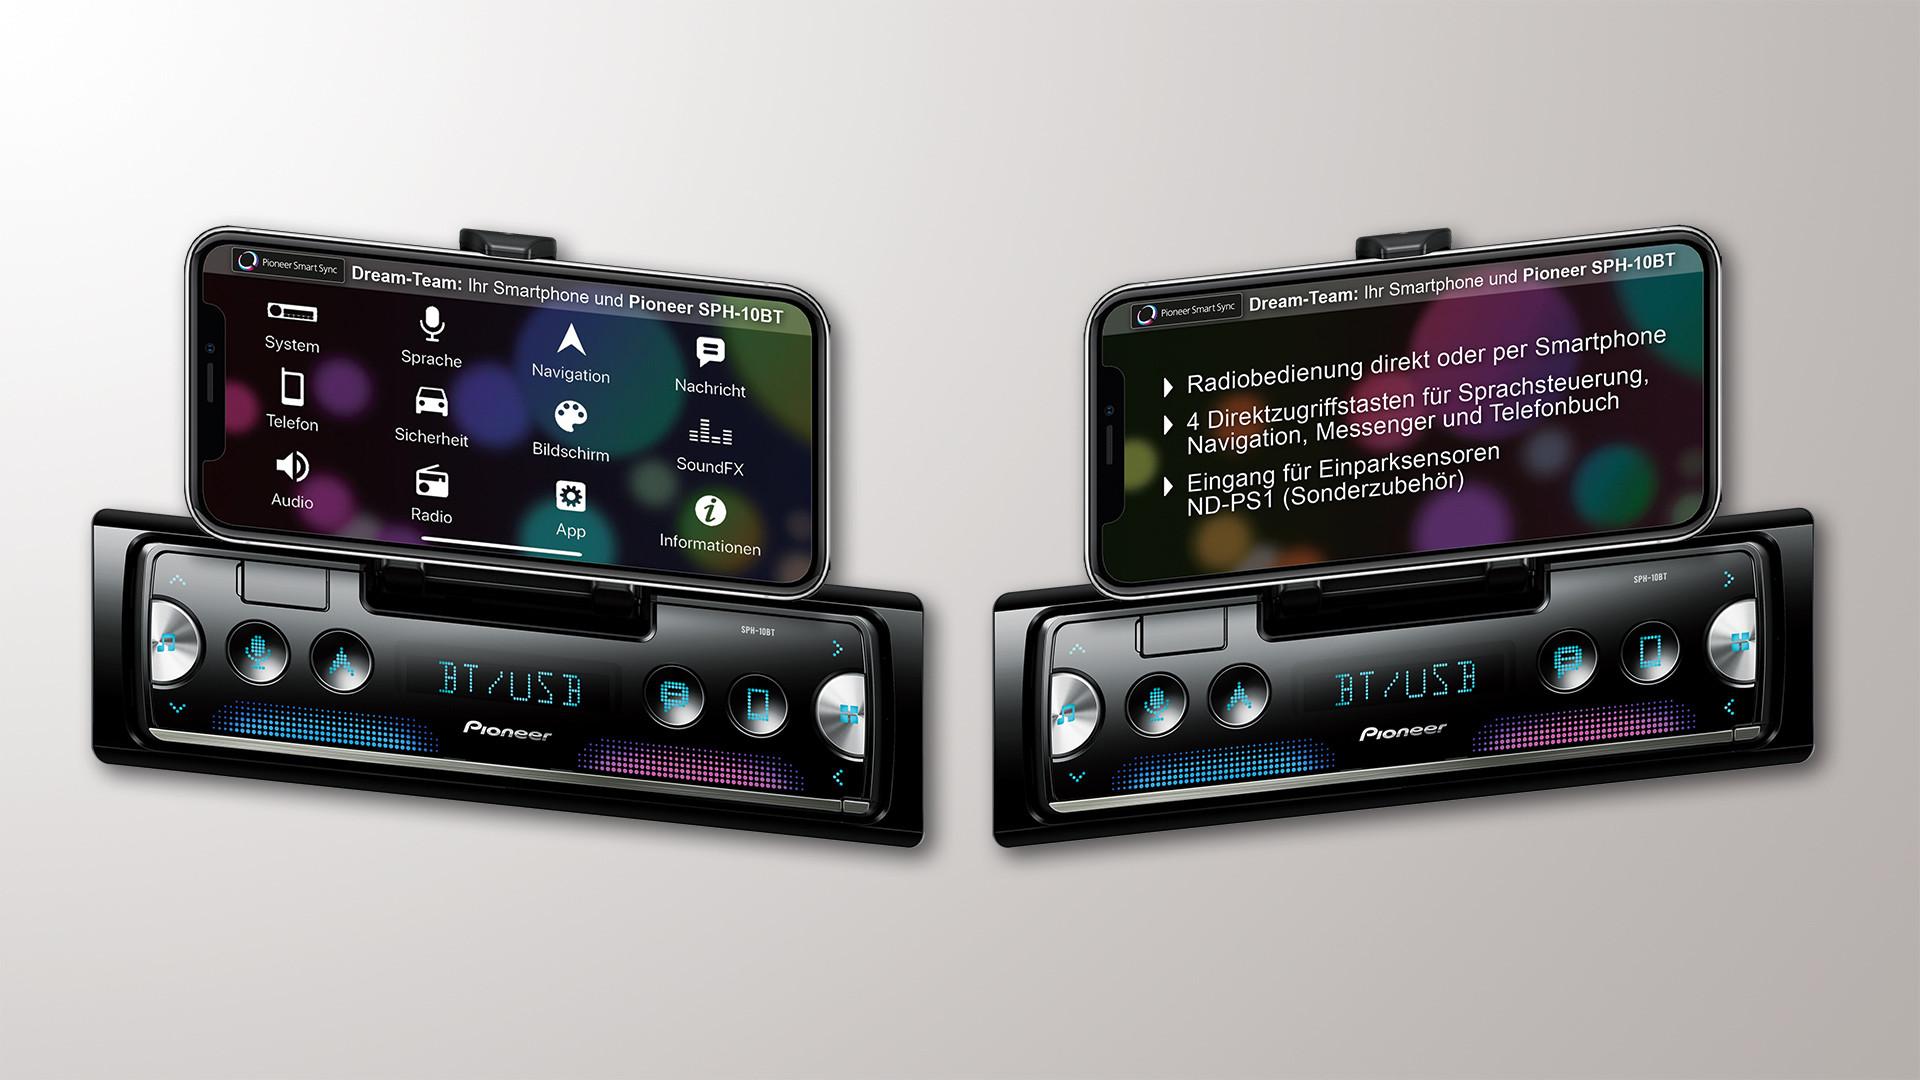 Pioneer_Smartphone-Dummy_01